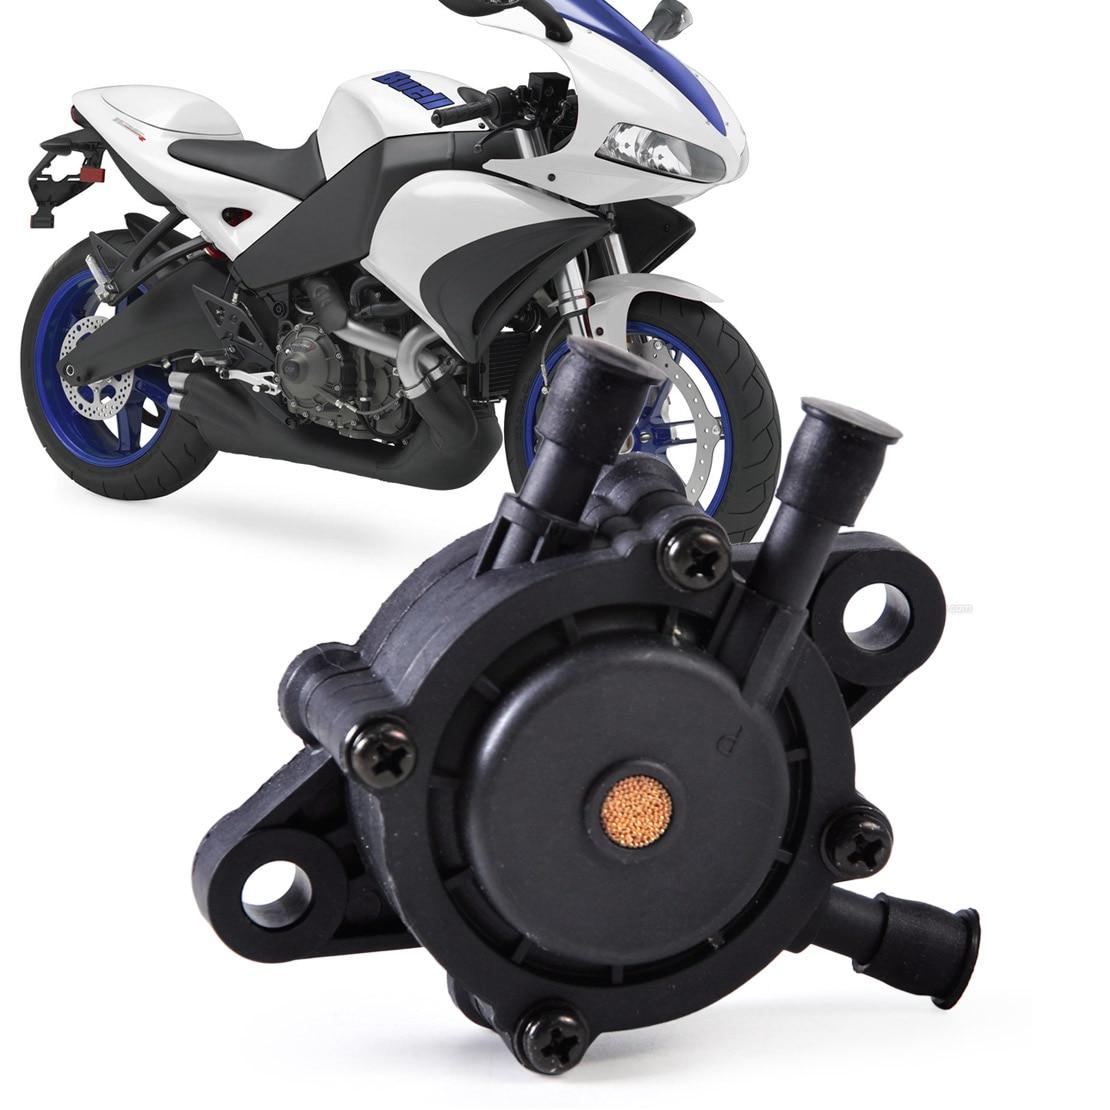 Beler топливный насос большого объема Walboro Pulse 16700-Z0J-003 16700-ZL8-013 для Honda GX200 160 Clone Engine Briggs Go Kart Racing